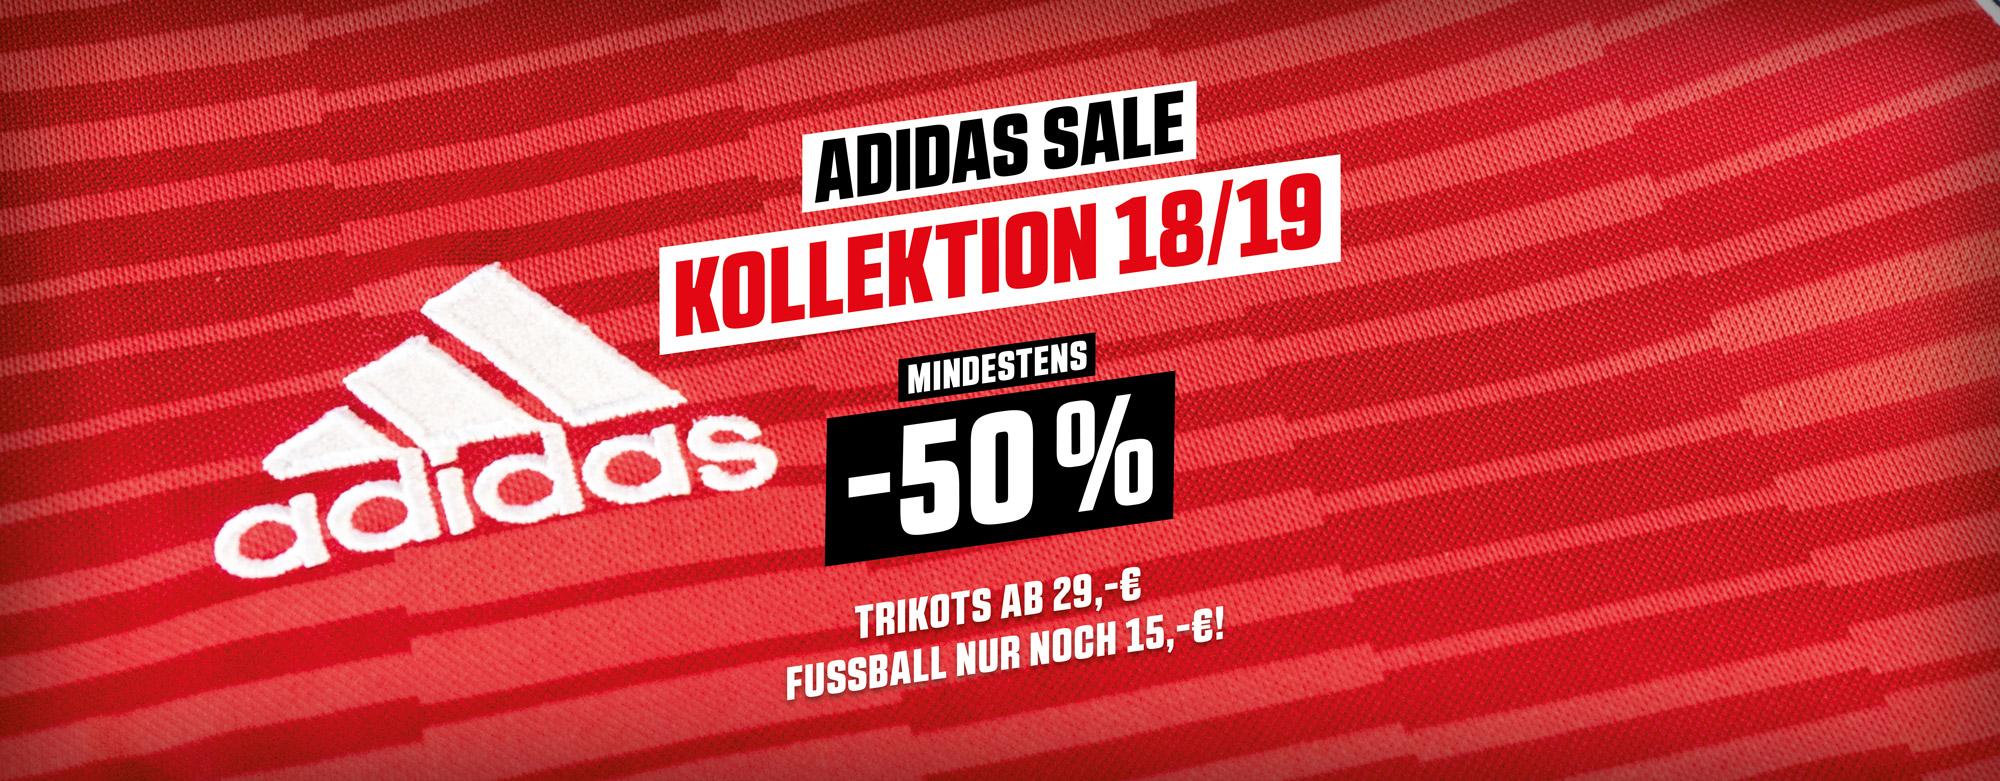 SALE Adidas 18/19